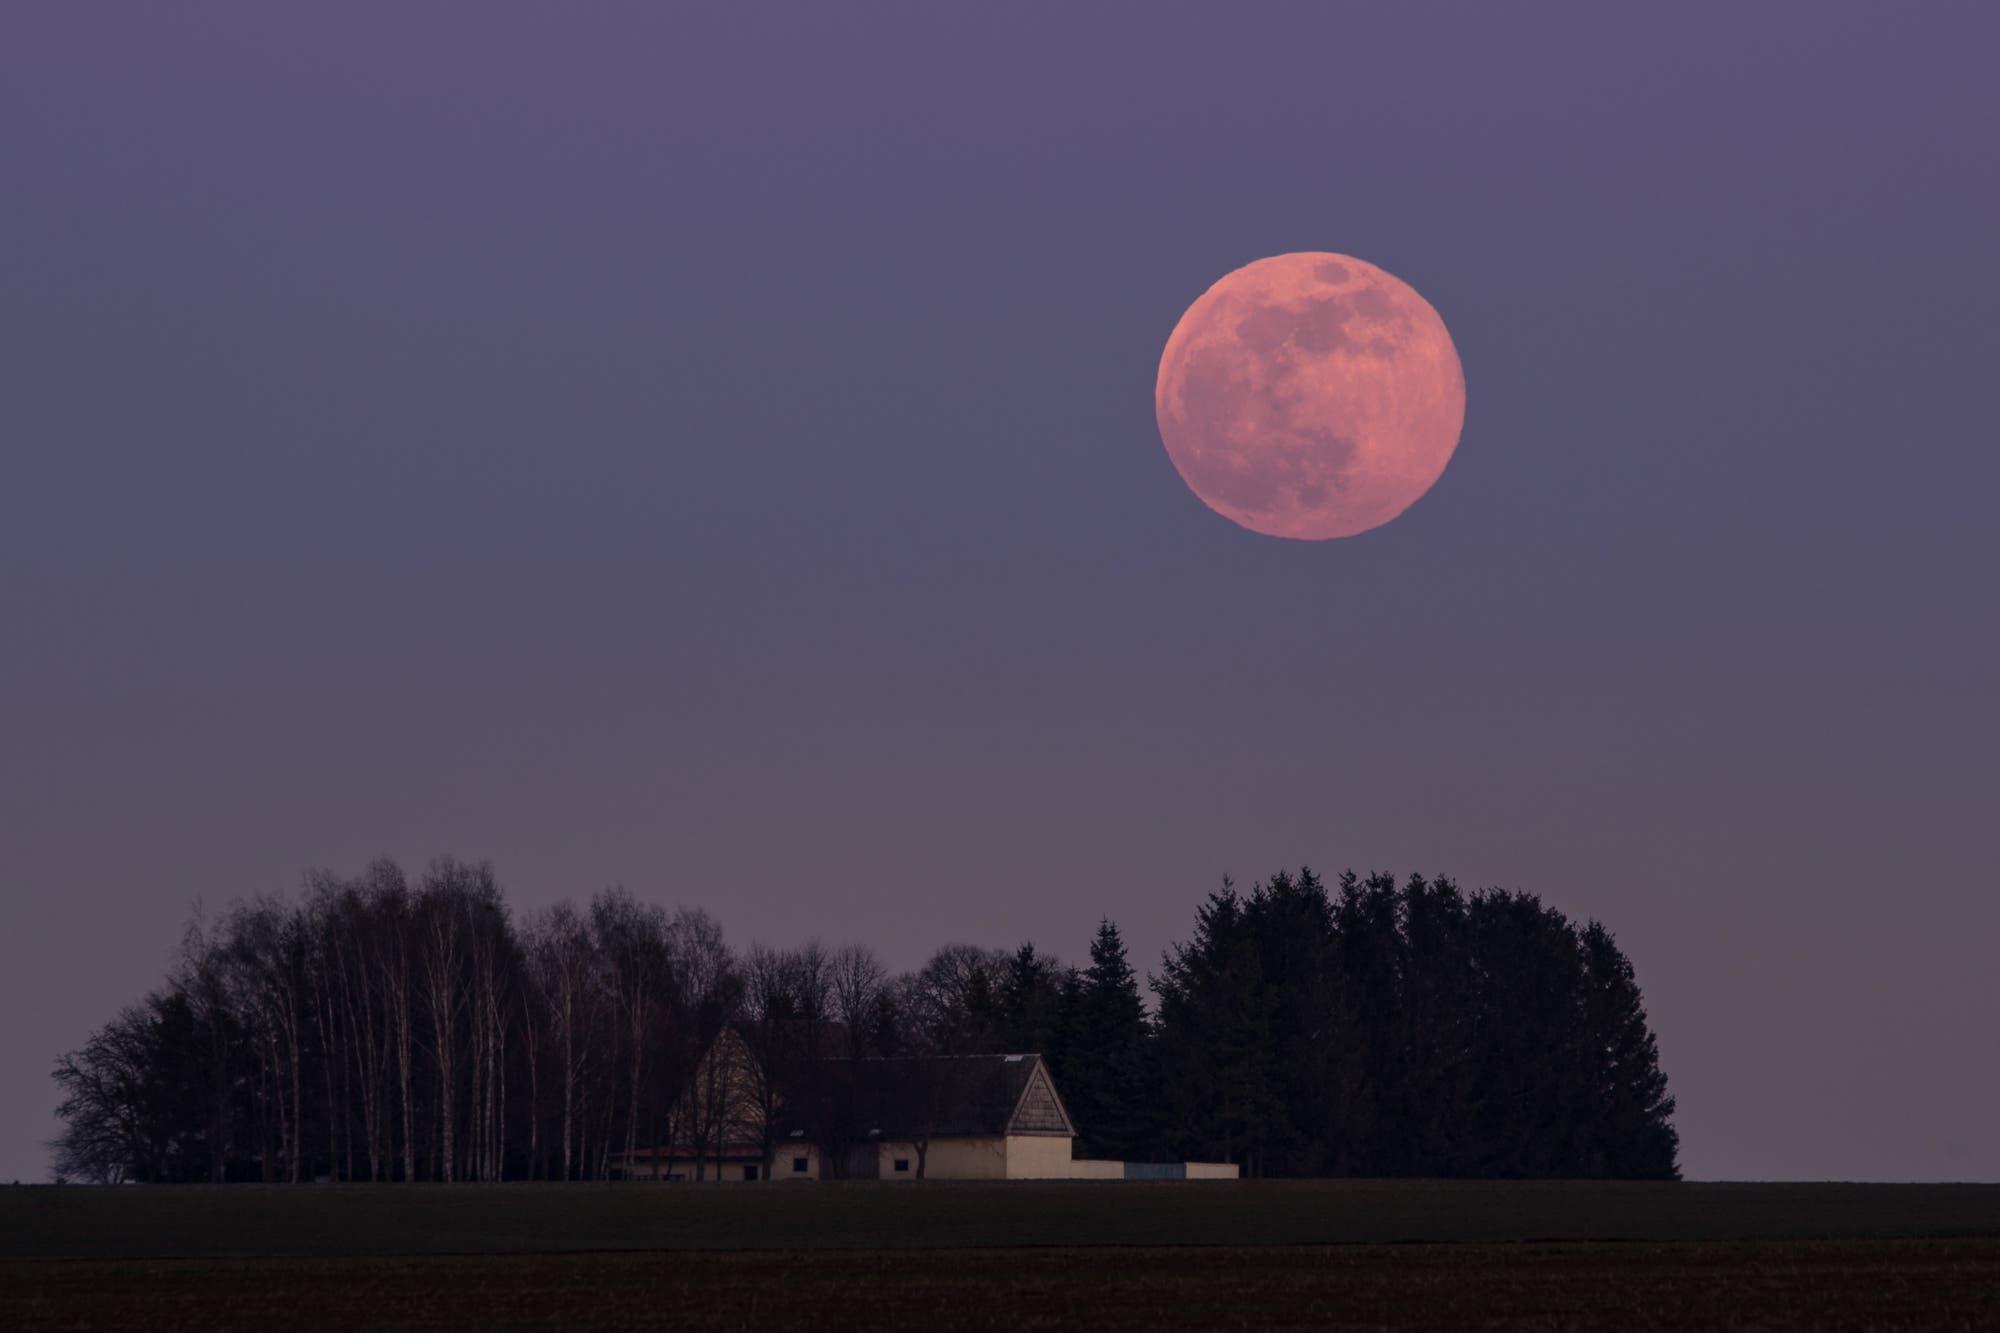 Wunderschöner Mondaufgang am 19. Februar 2019